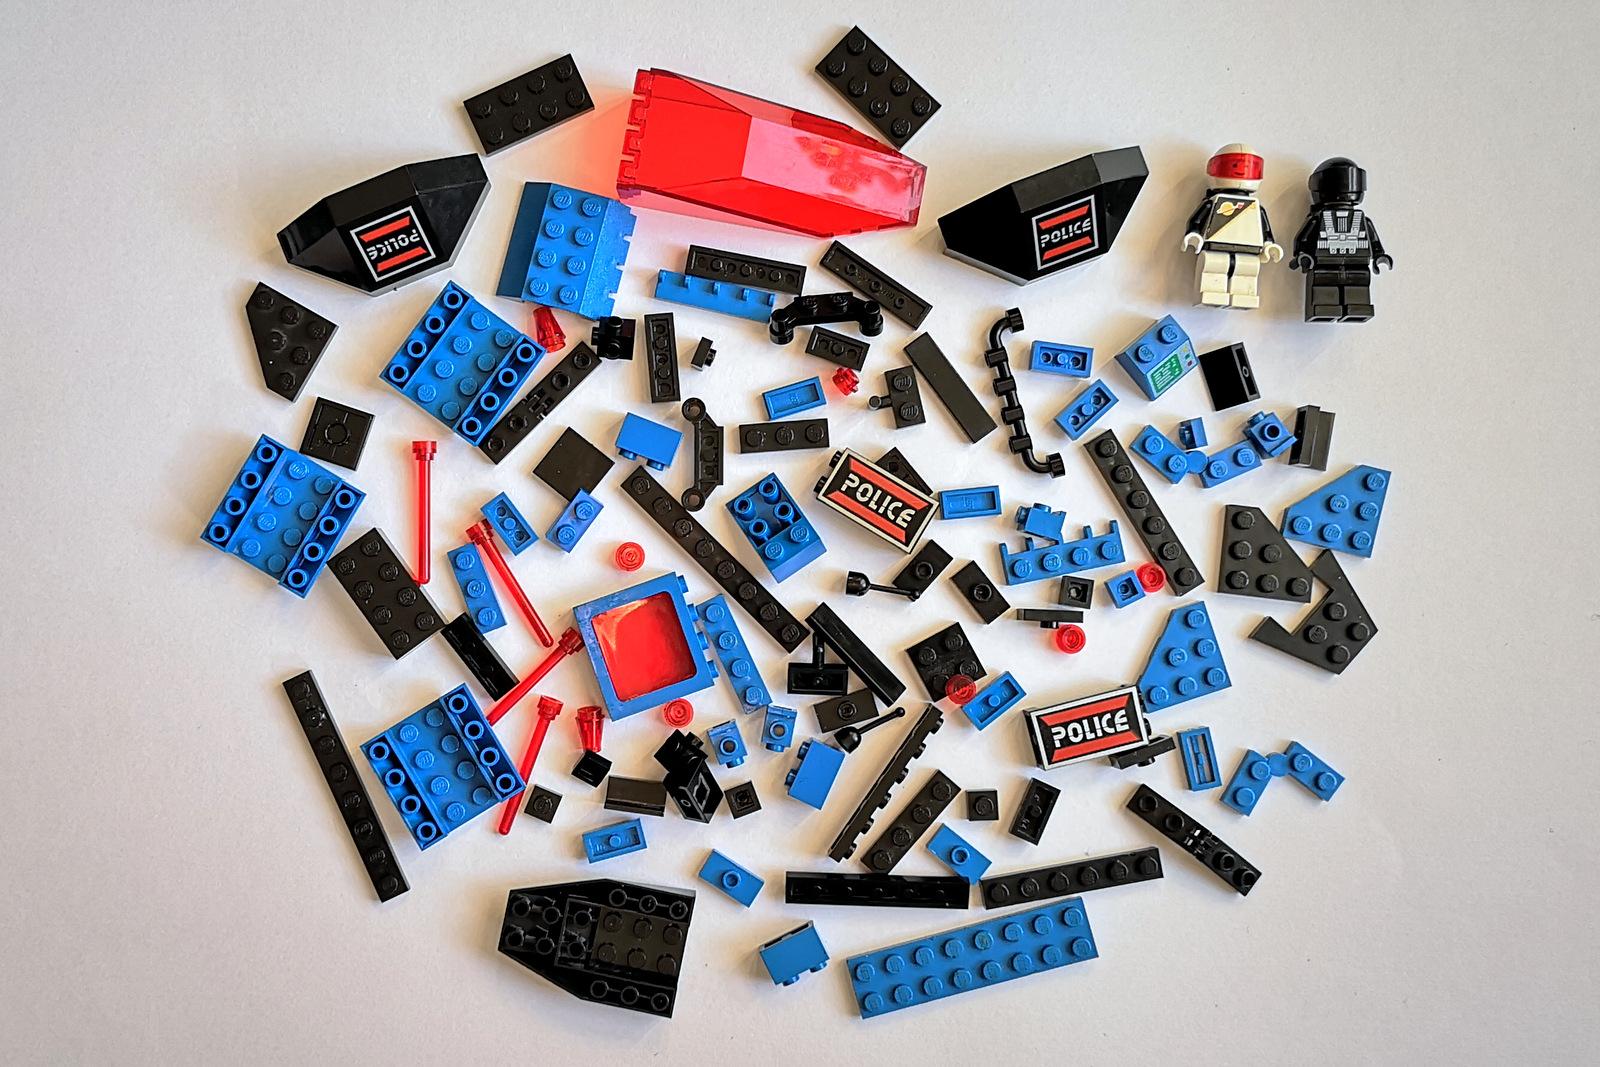 6886 LEGO Space Police Teile